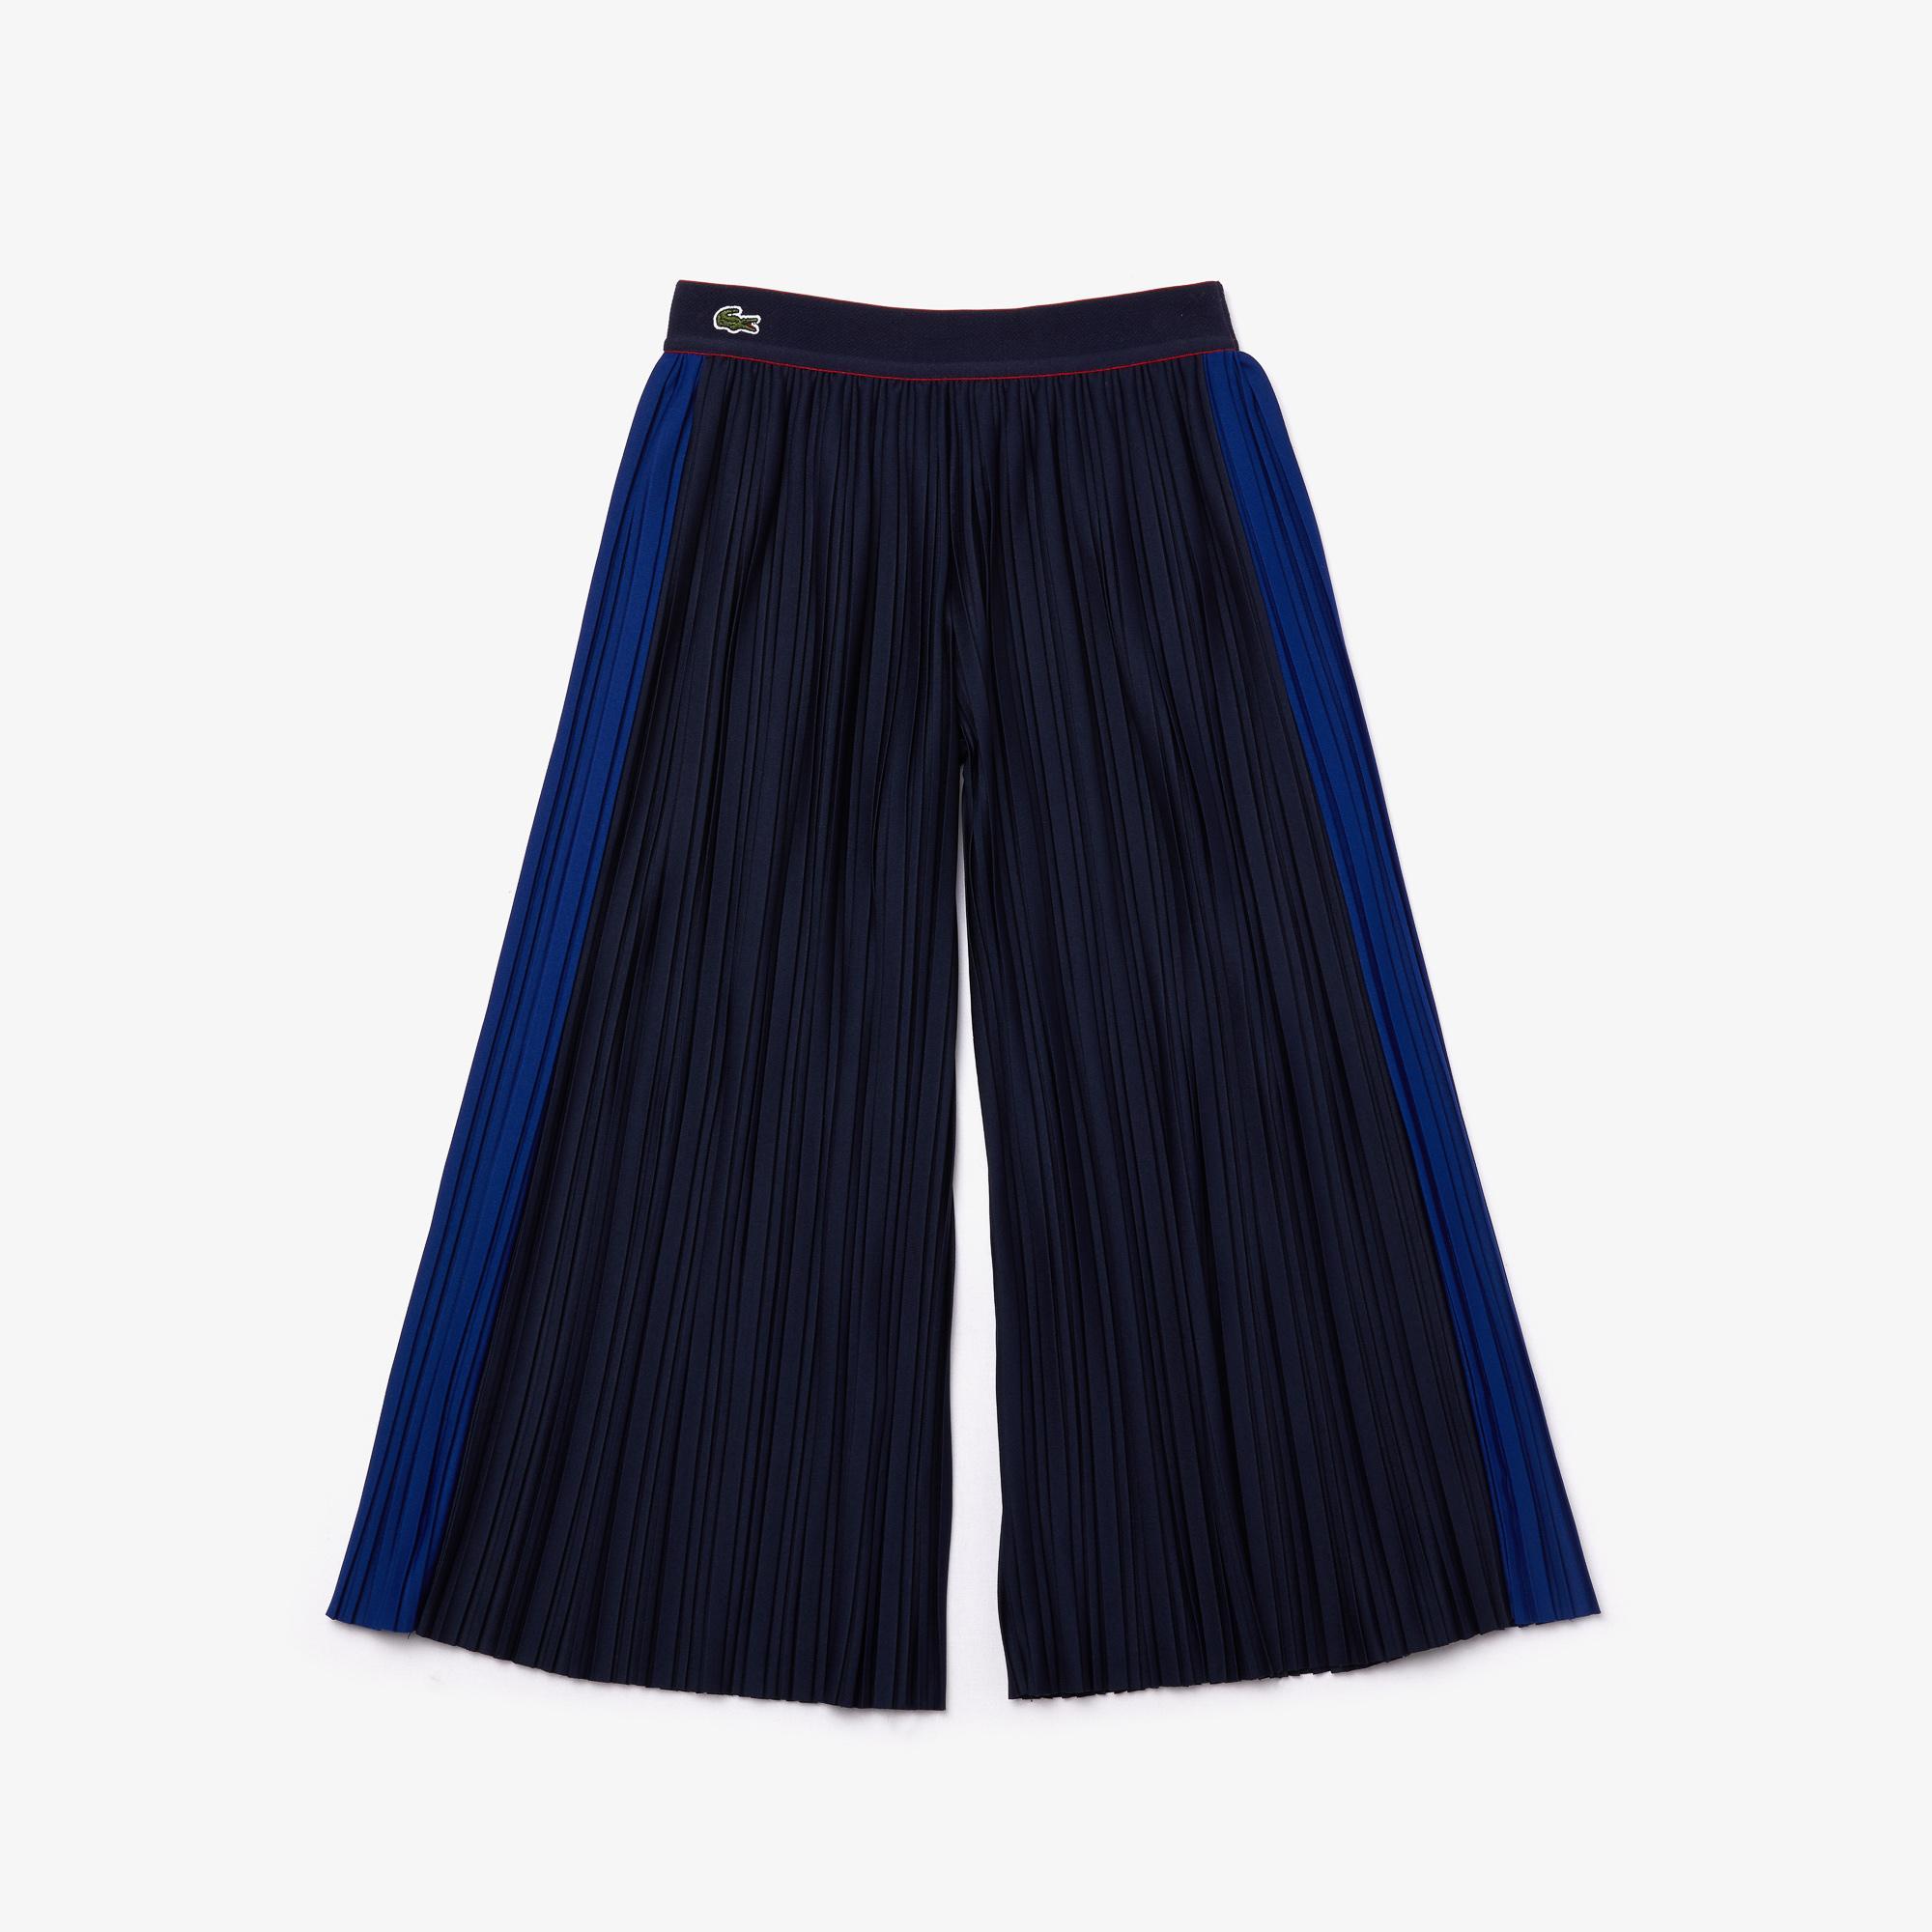 Lacoste Çocuk Çizgili Lacivert Pantolon